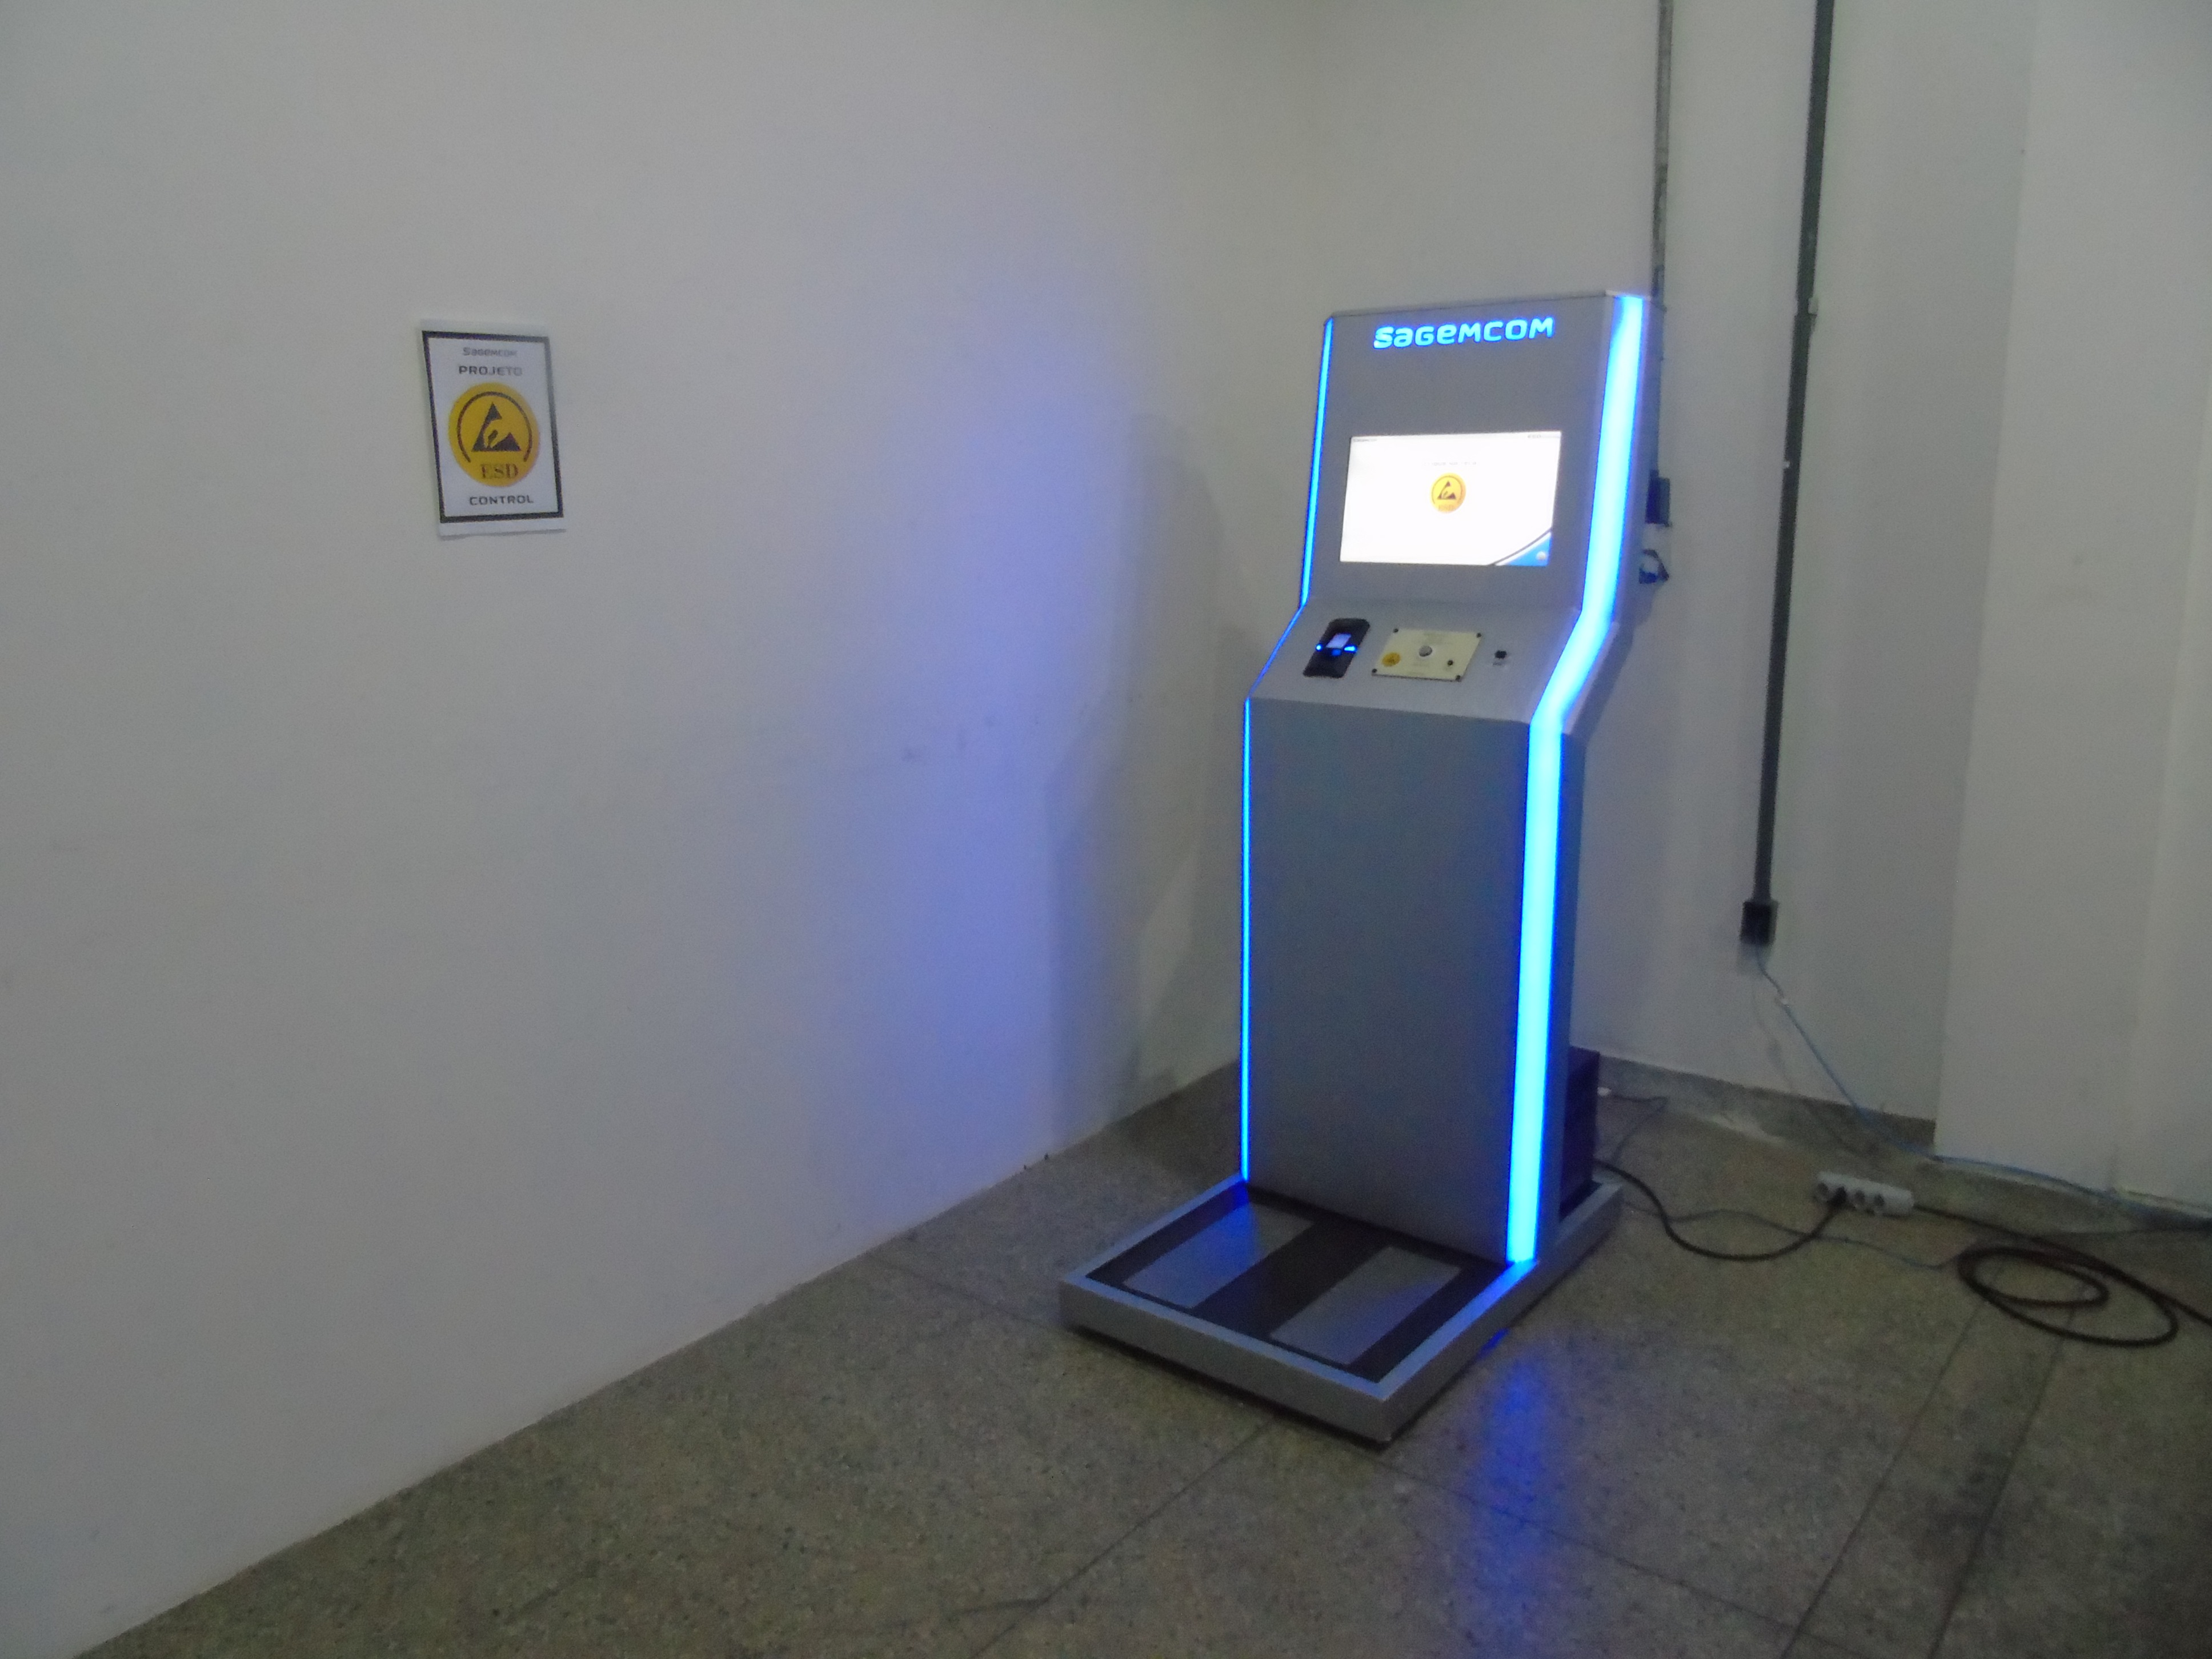 DSC00808.JPG